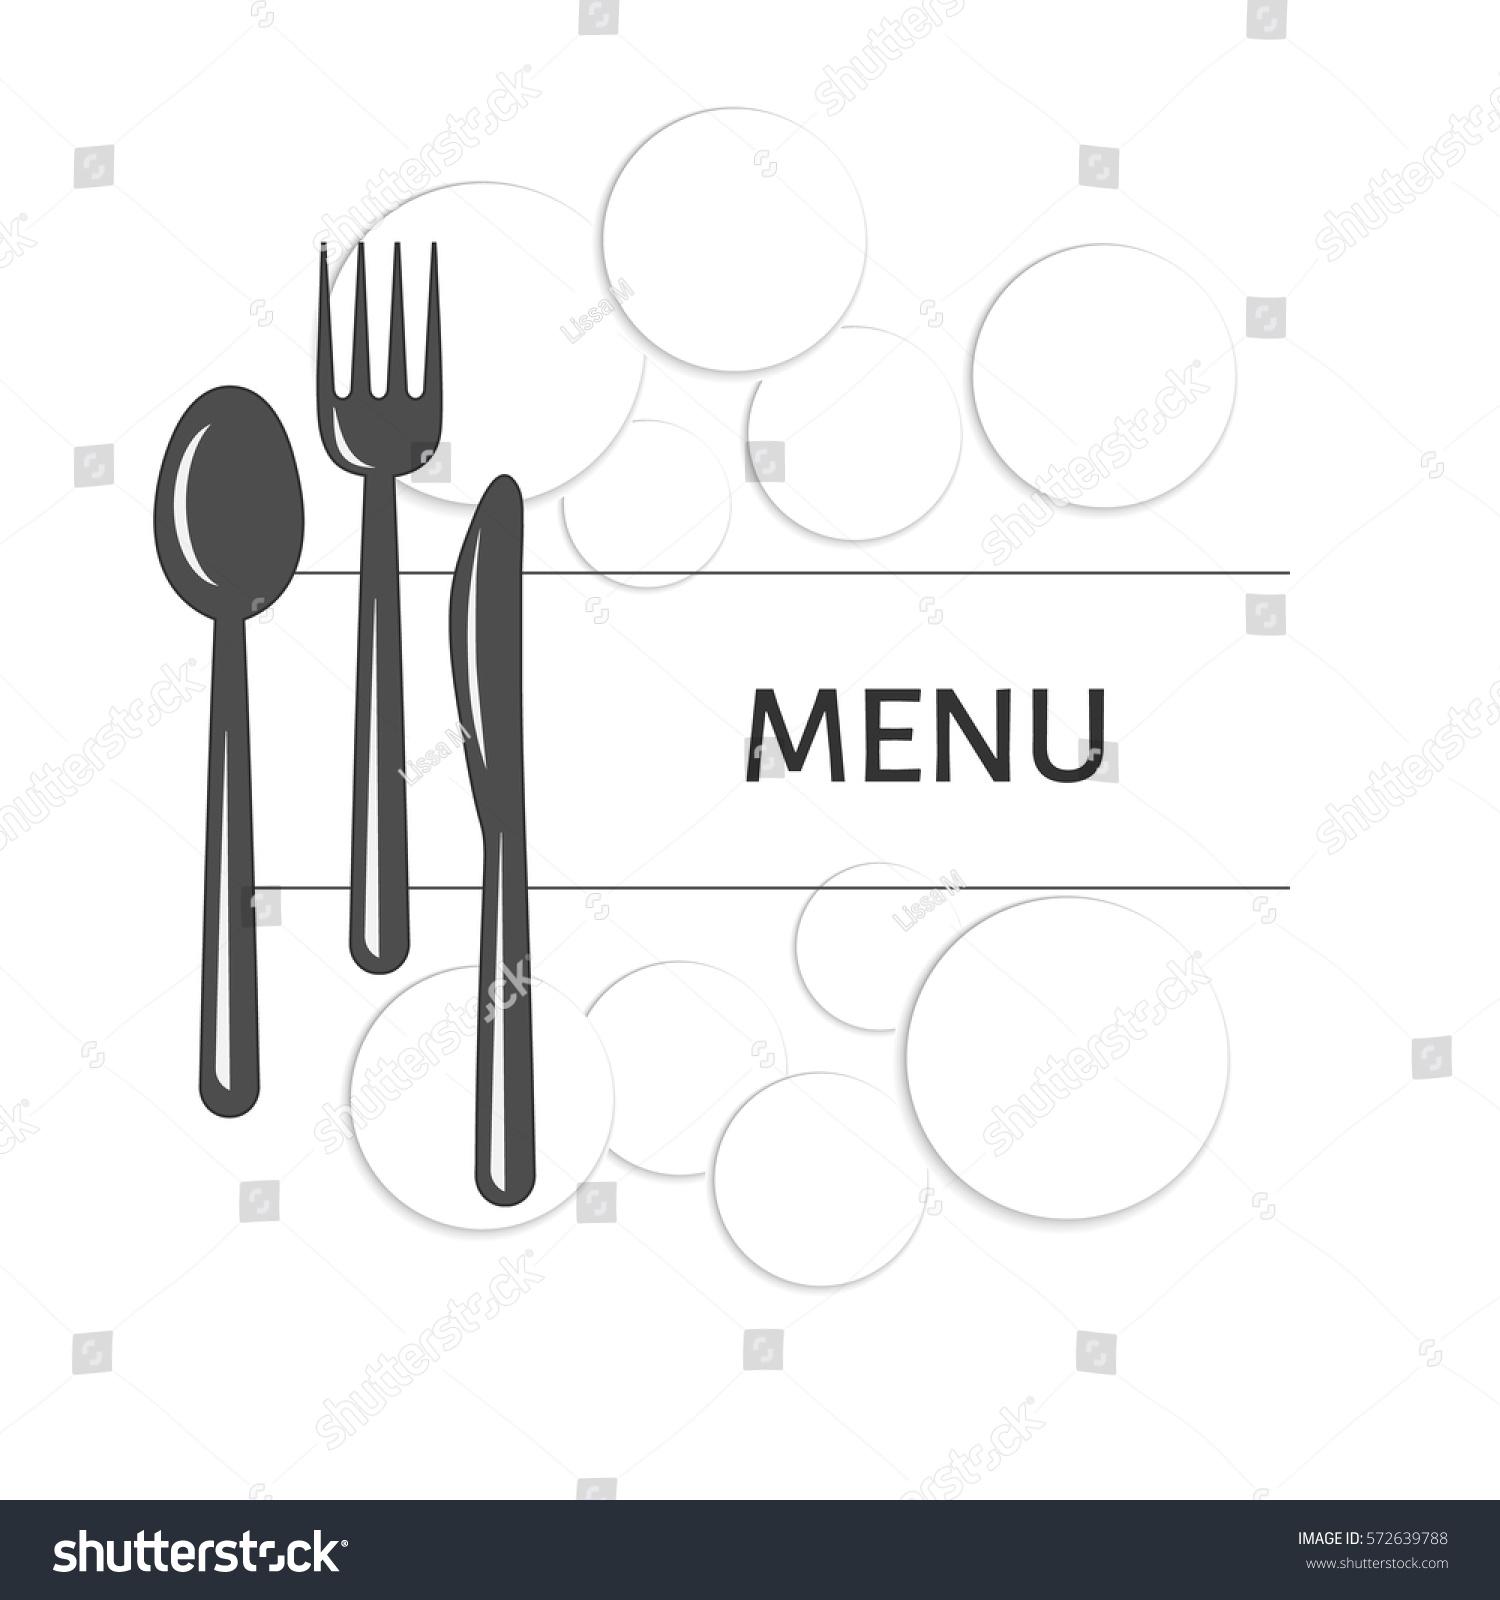 Restaurant menu design vector illustration background